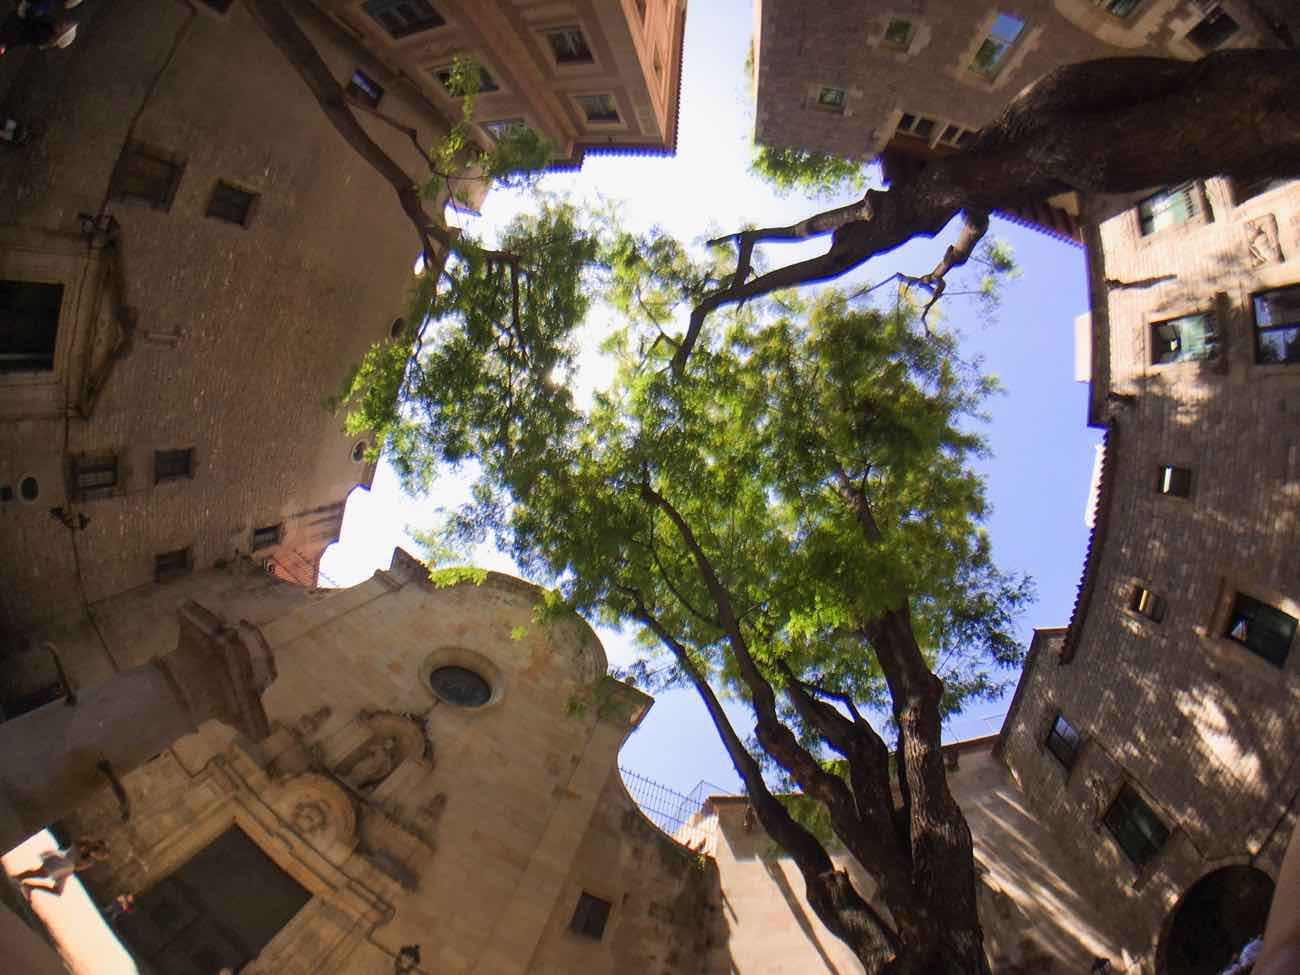 best smartphone camera lens review placa sant felipe neri